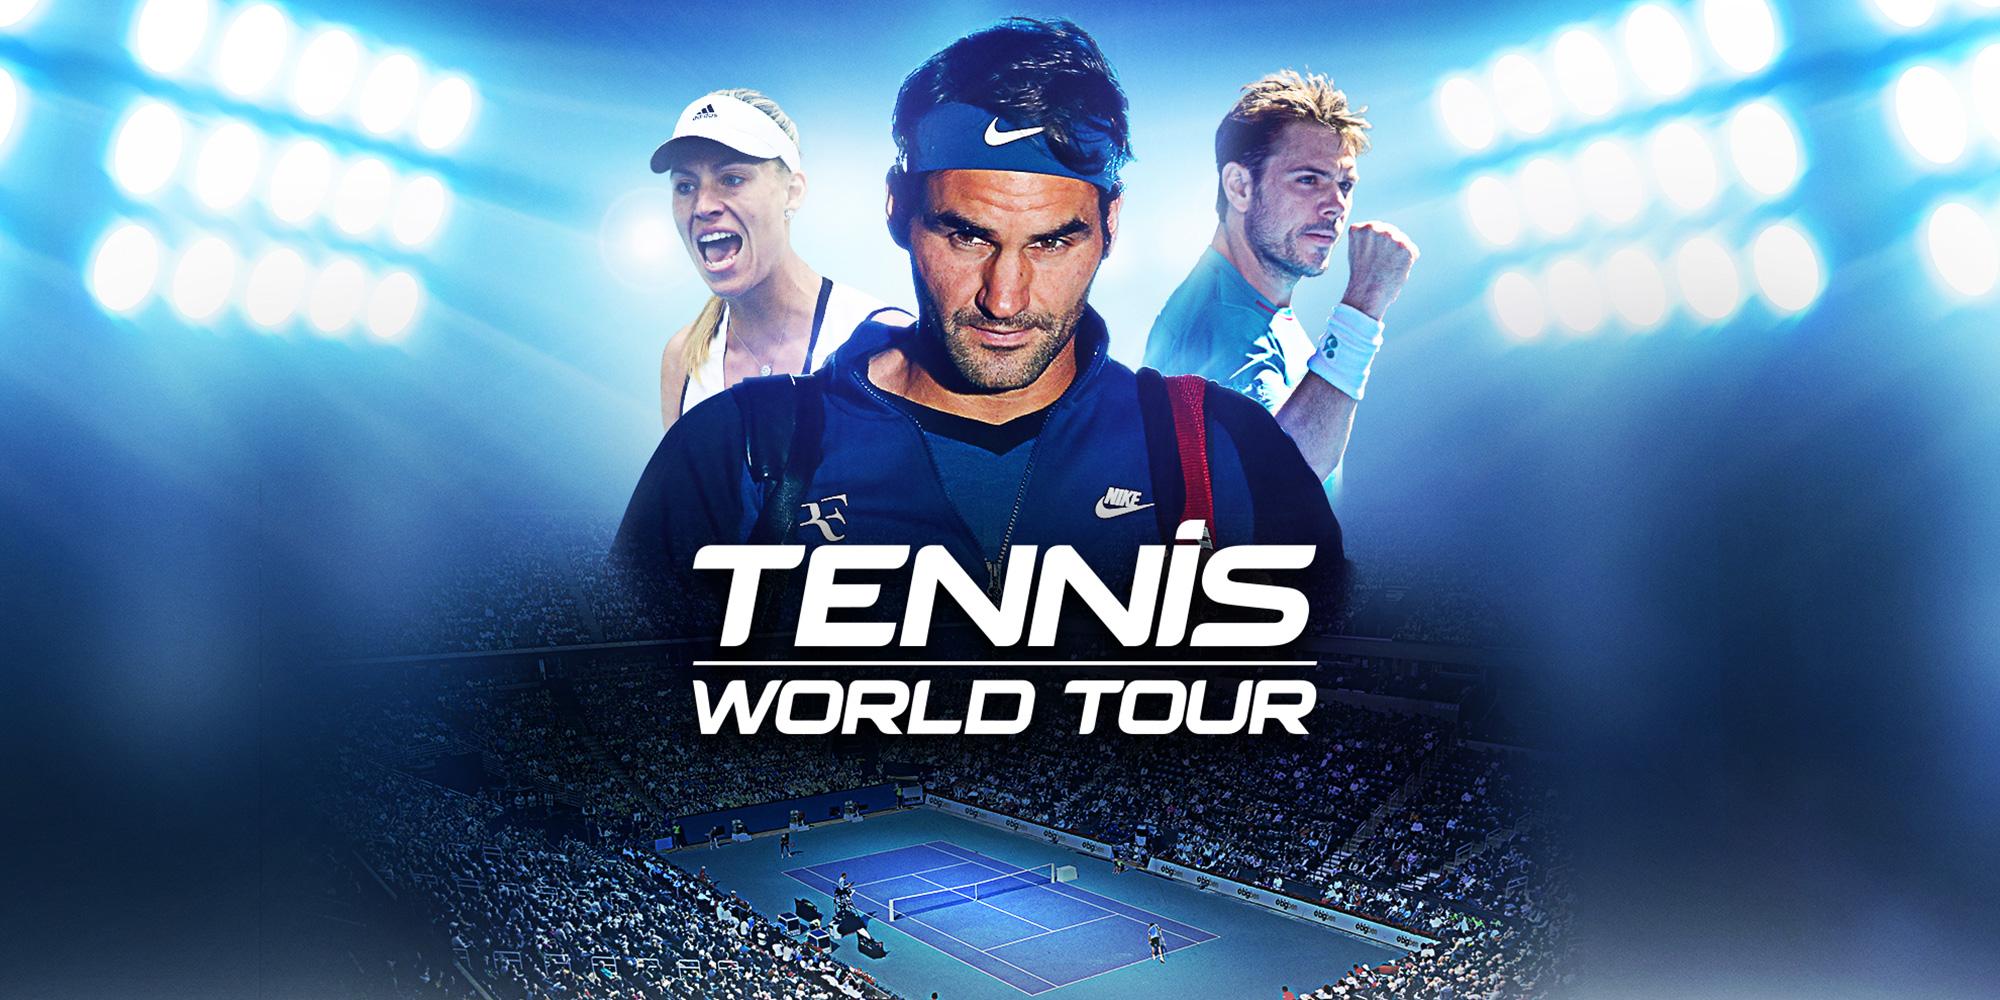 Tennis World Tour - Mutua Madrid Open